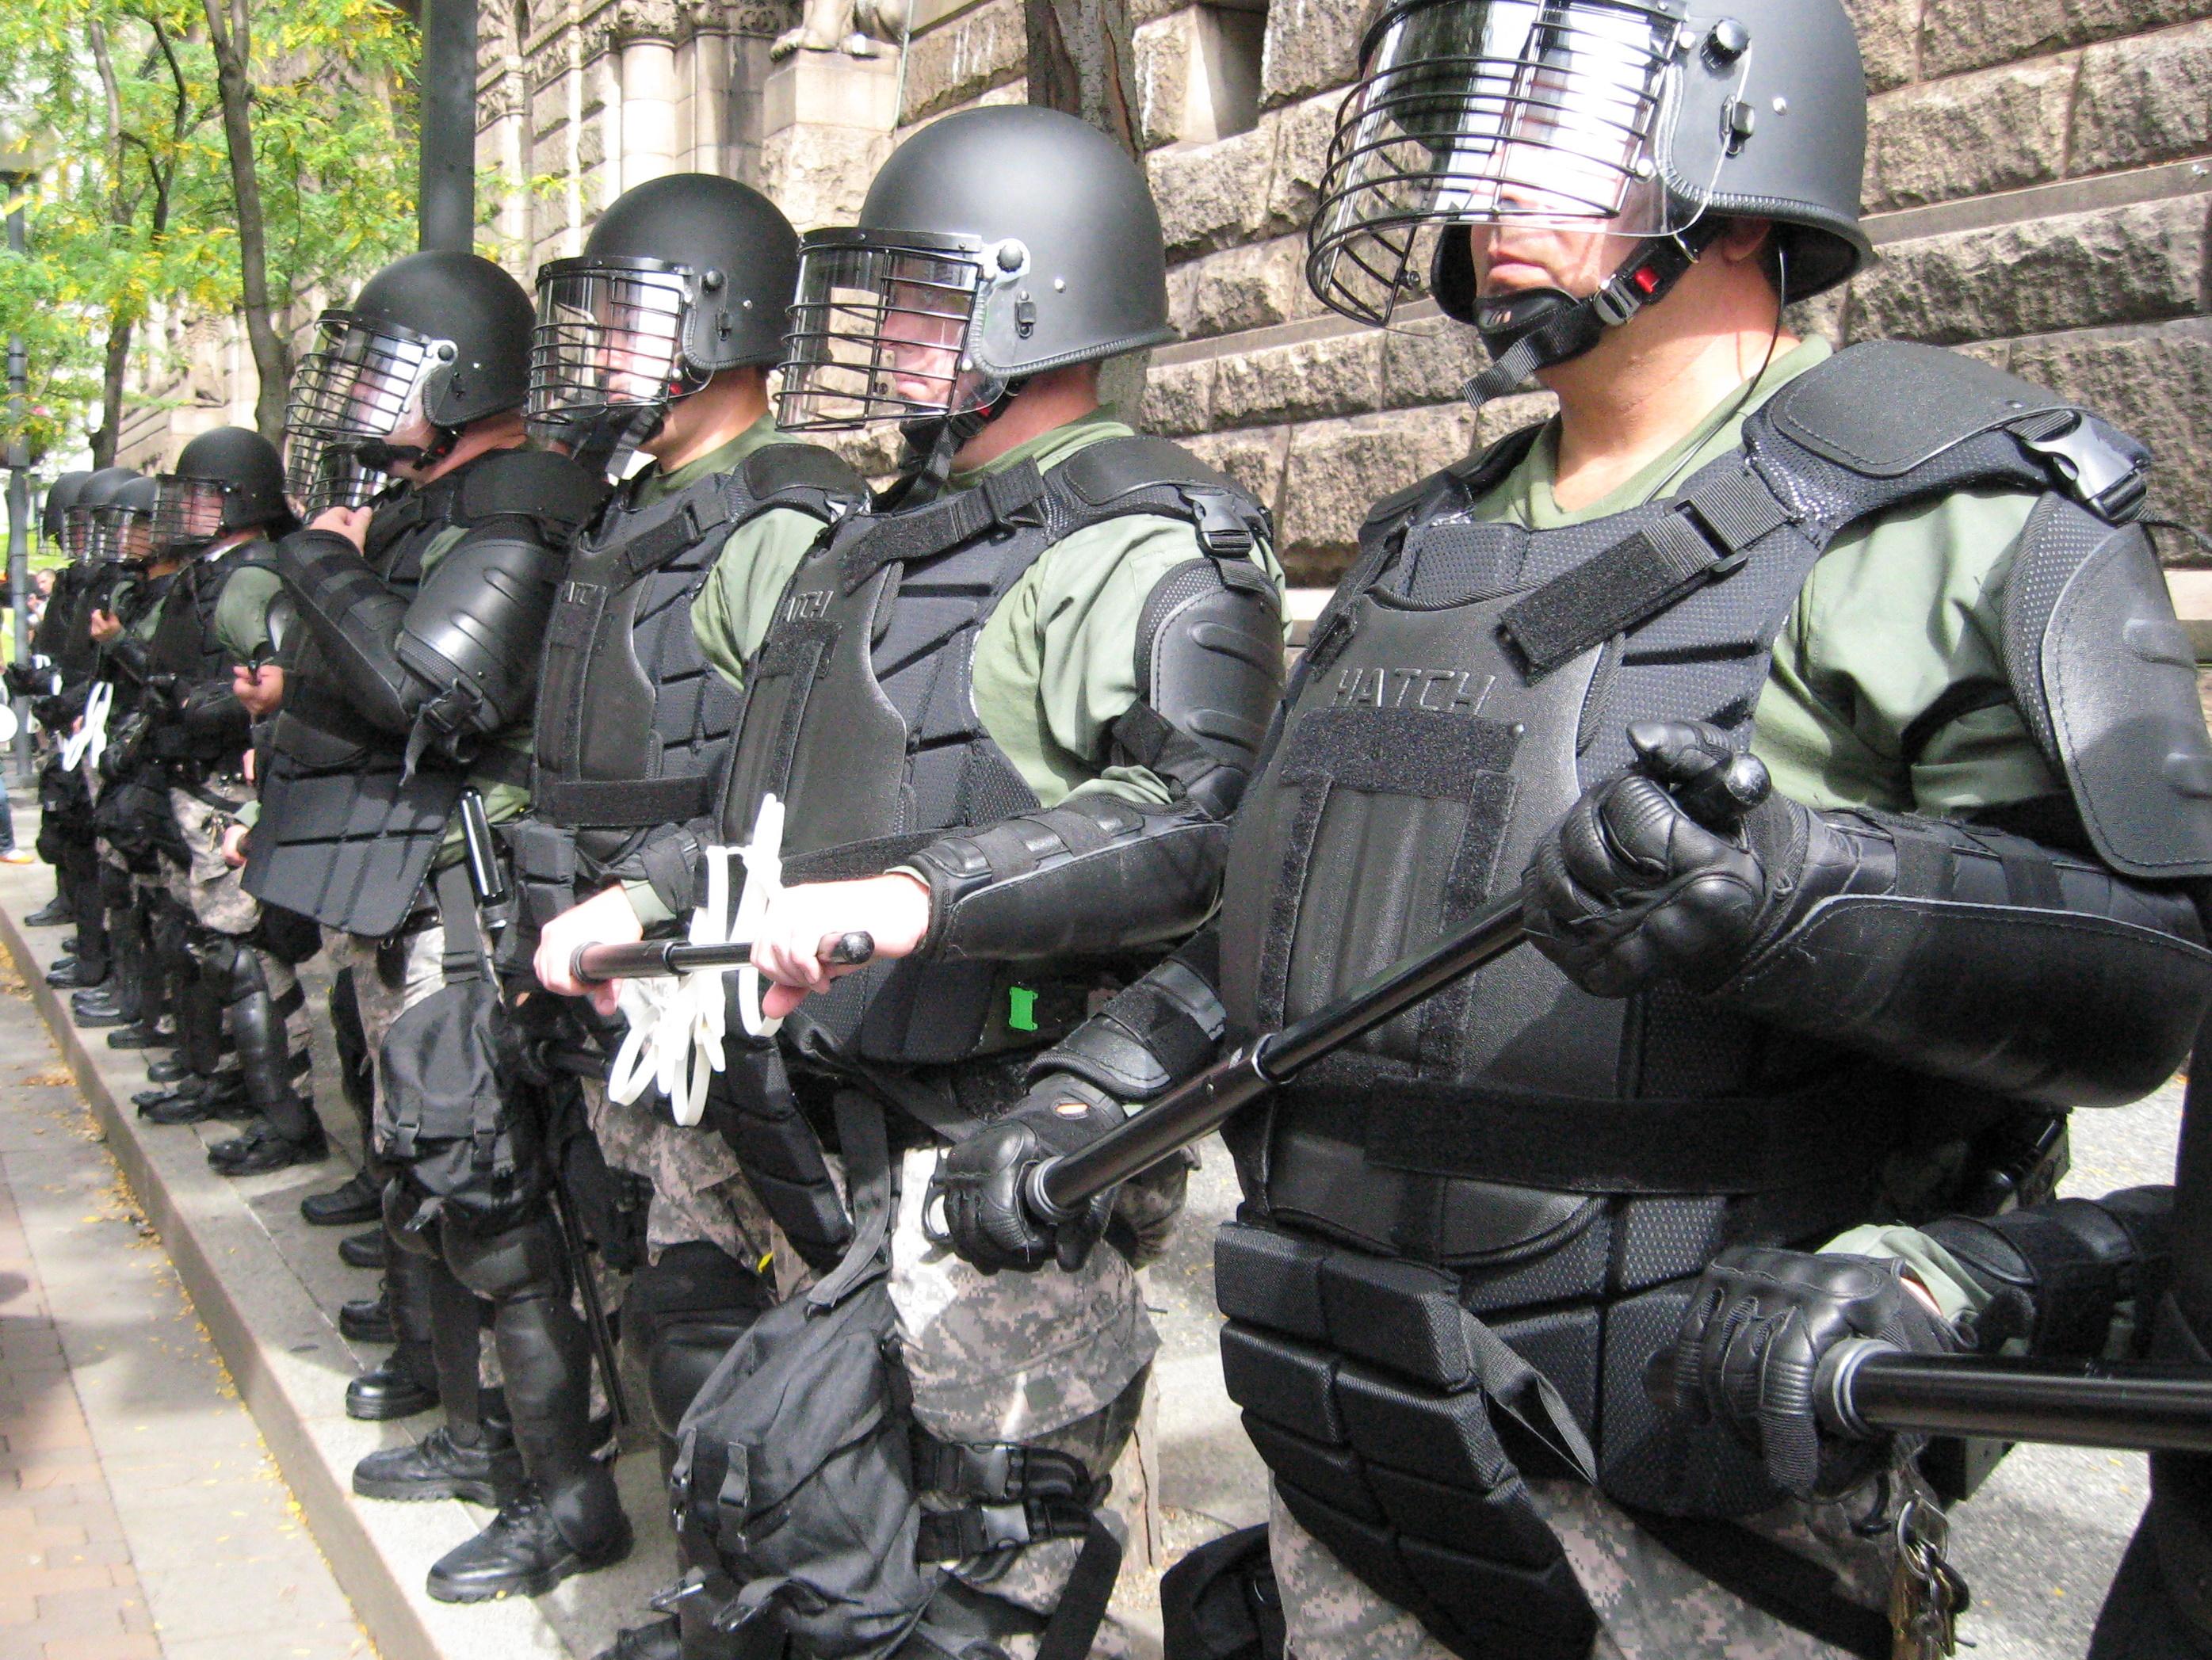 Politivakt 17 mai feiring Hønefoss sentrum